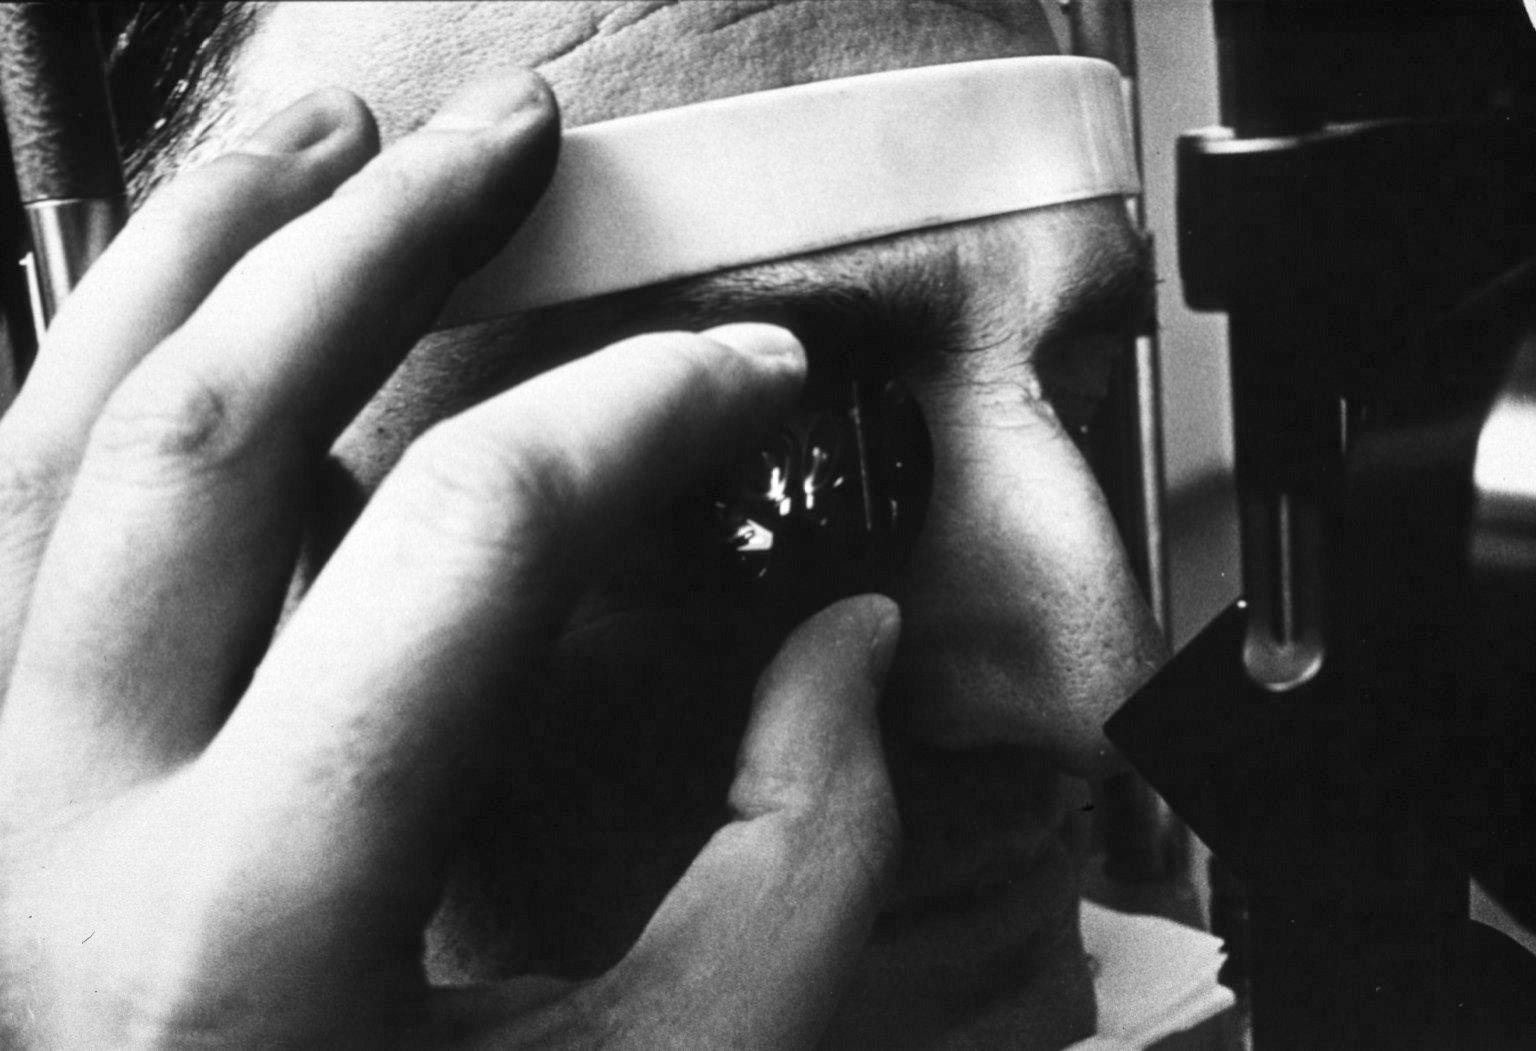 3-mirror_glass_to_diagnose_retinal_detachment.jpg